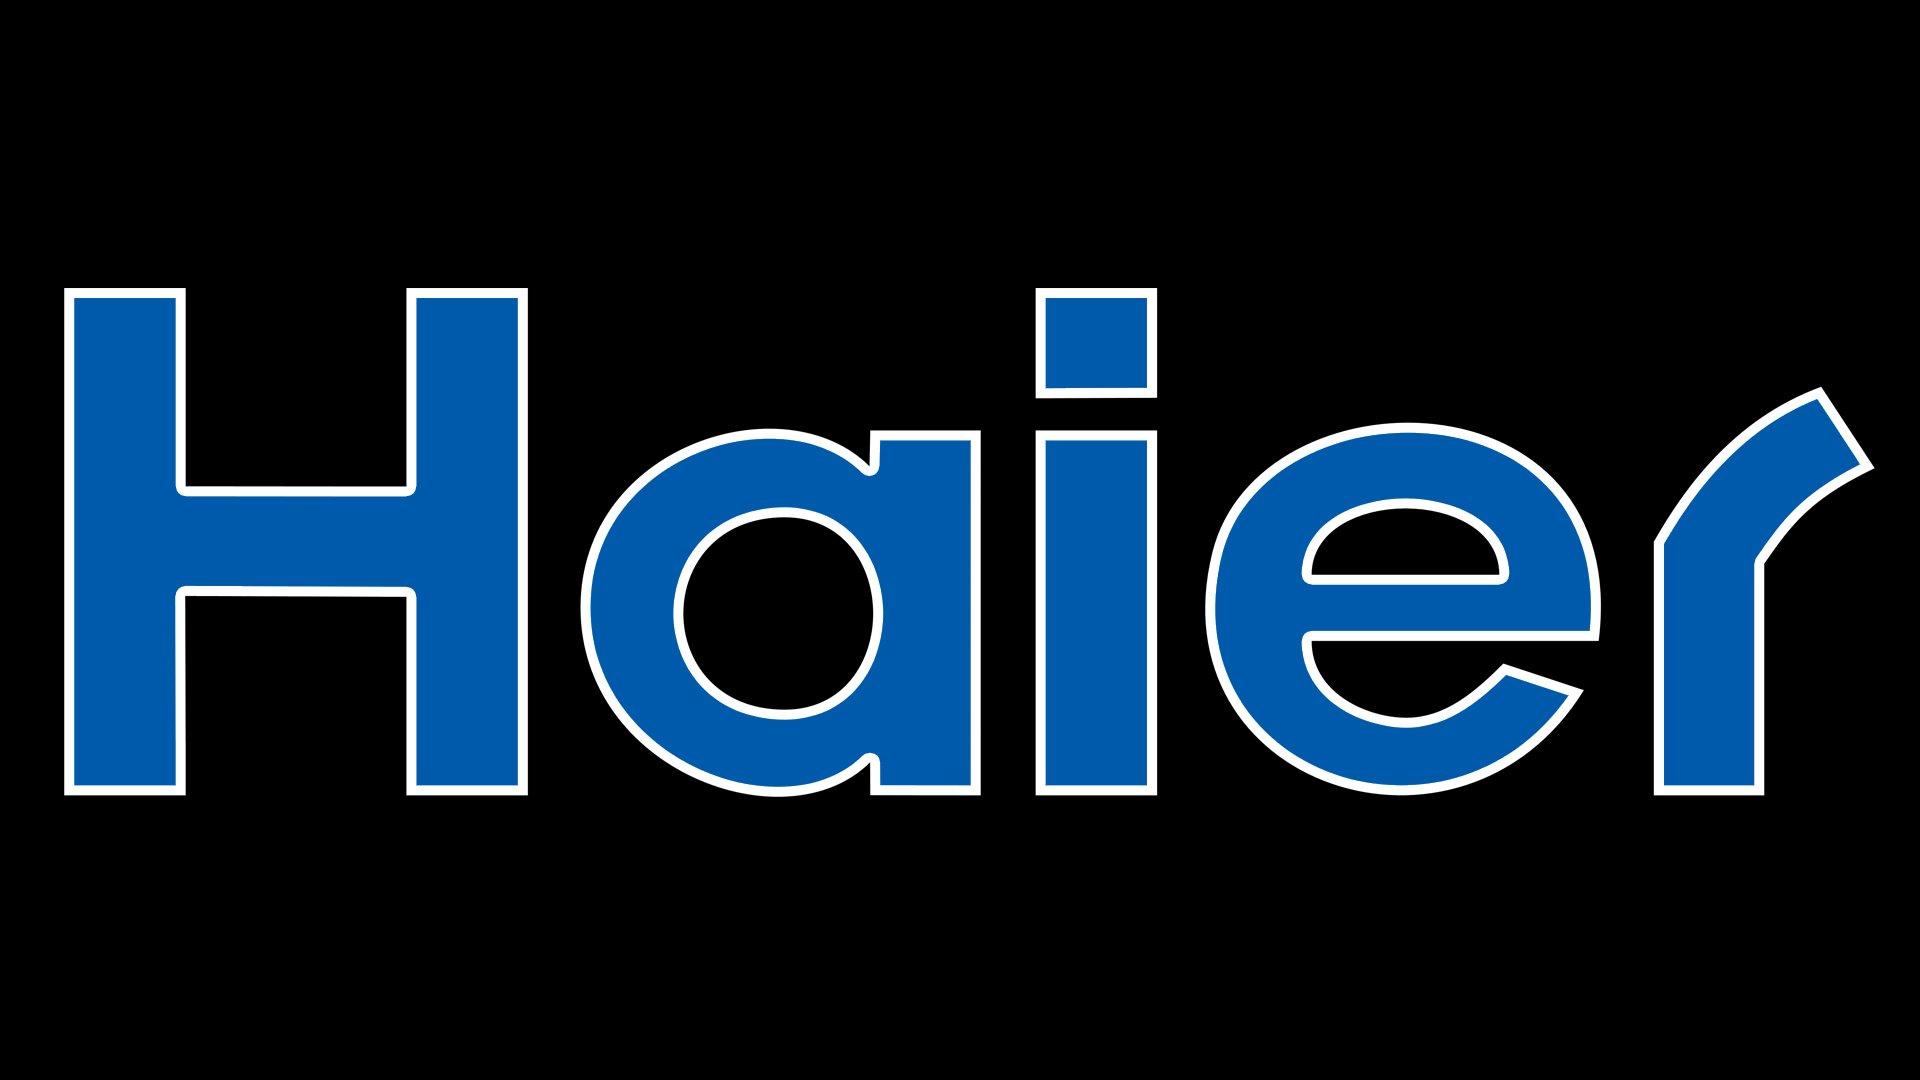 Haier logo haier symbol meaning history and evolution haier symbolg buycottarizona